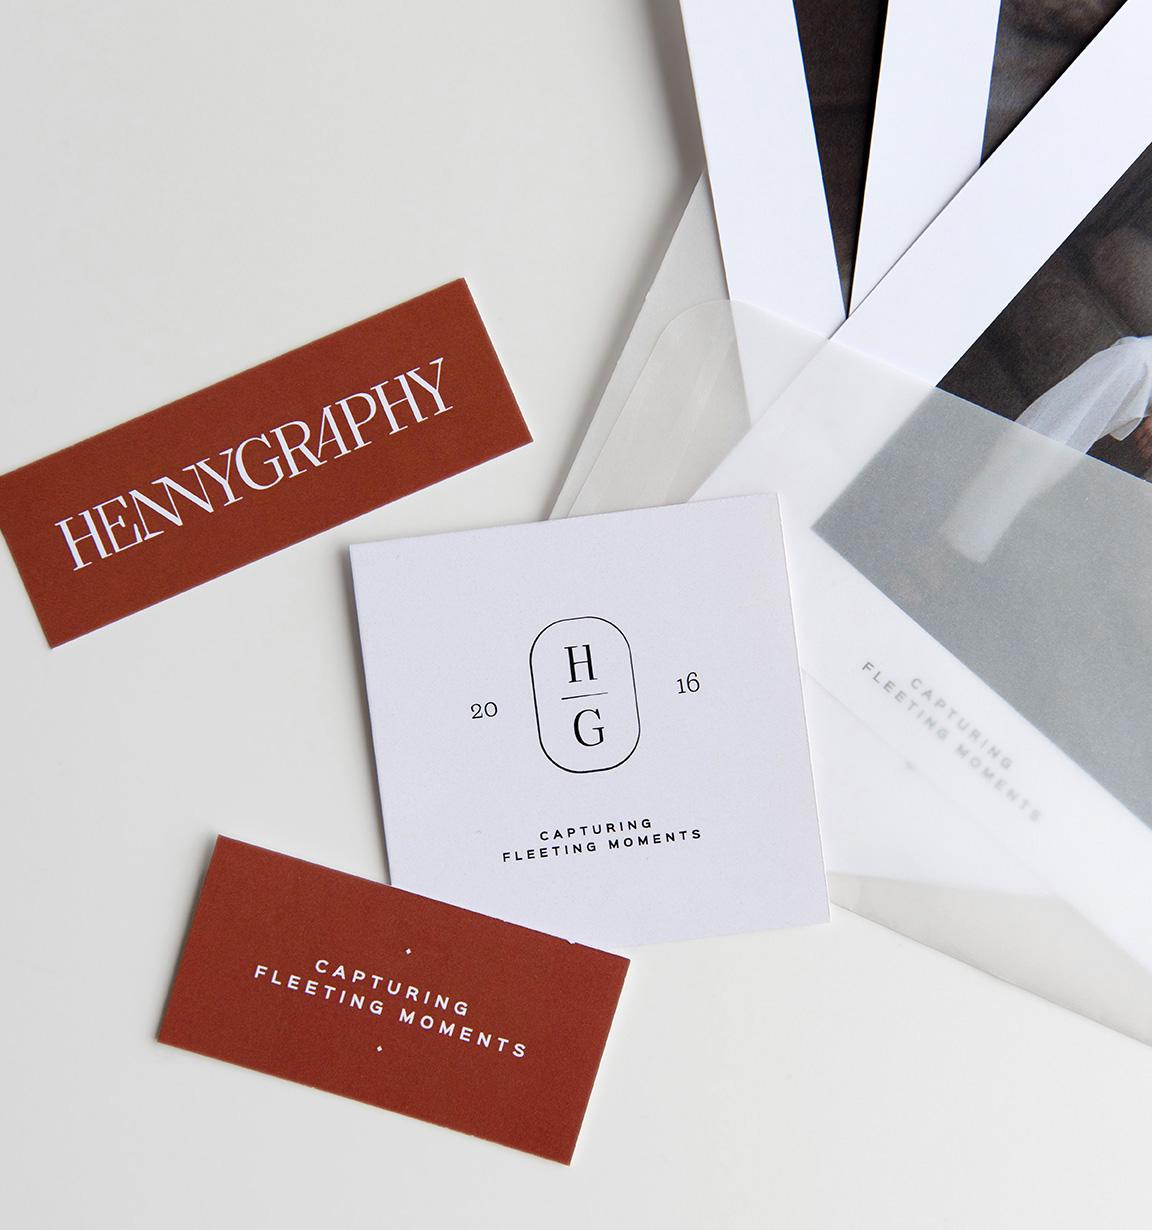 Hennygraphy Vancouver Editorial Photographer Branding and Print Design | www.alicia-carvalho.com